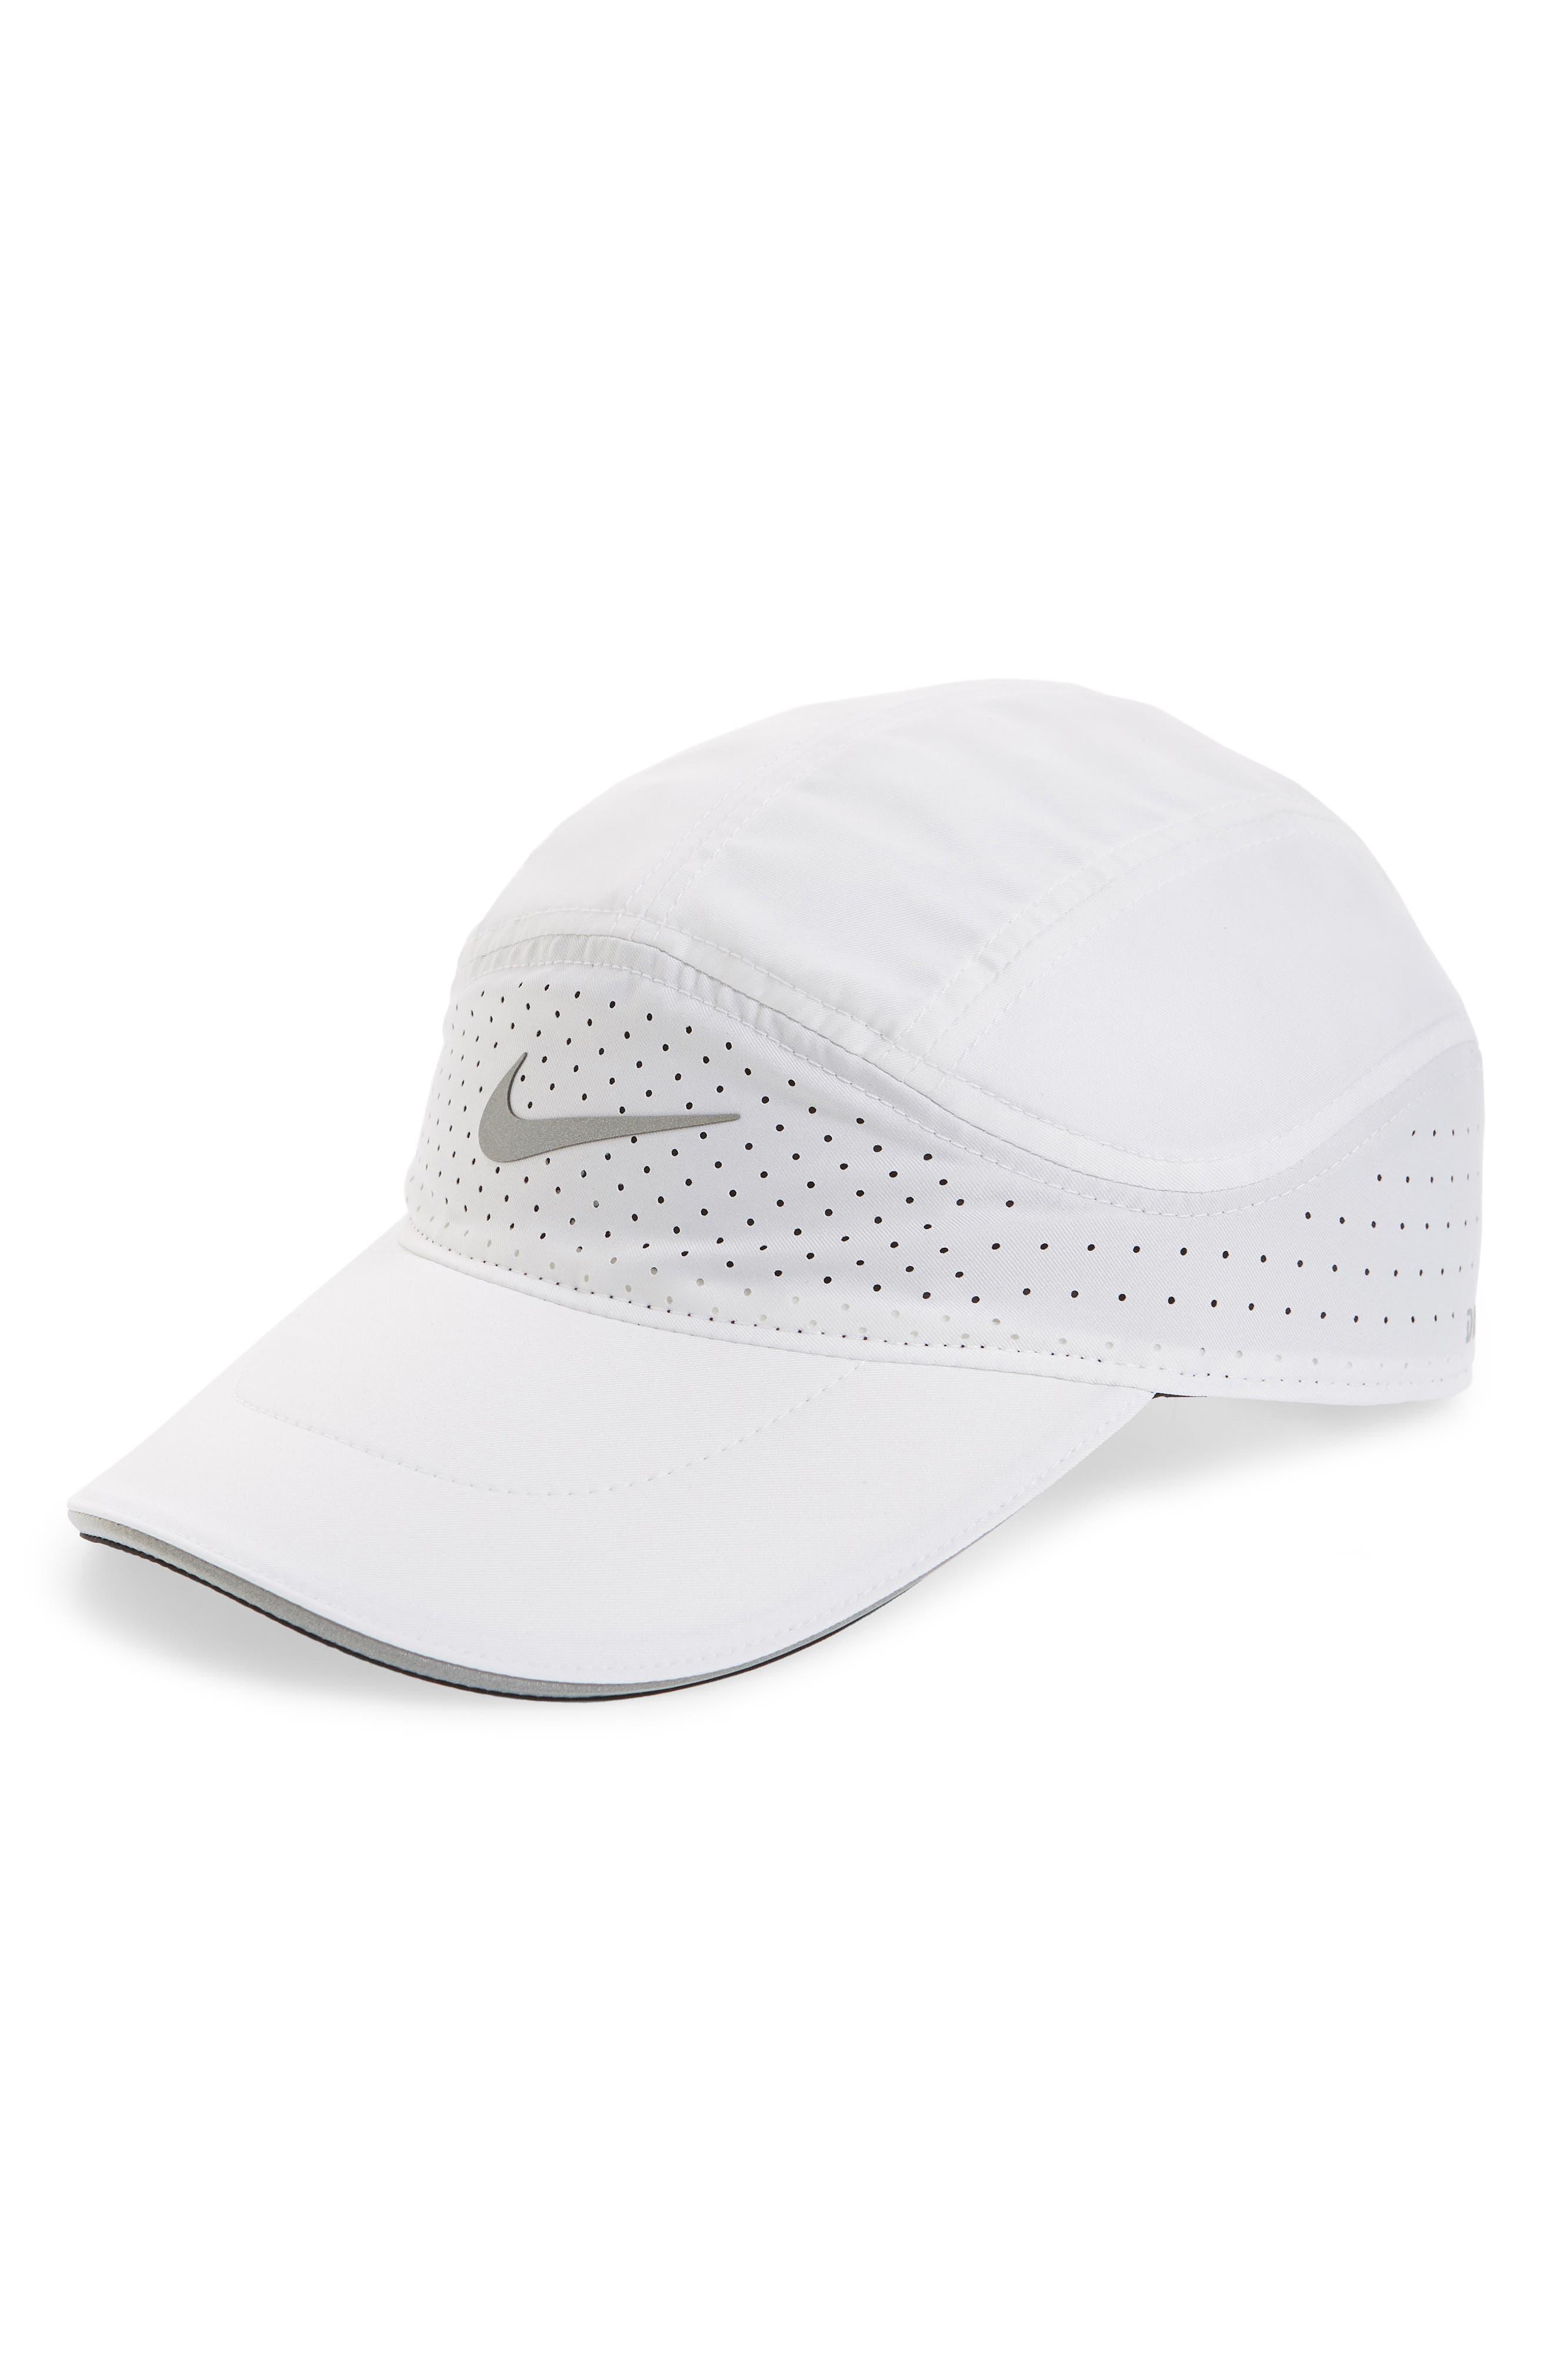 75882c13bc Men's Hats, Hats for Men | Nordstrom